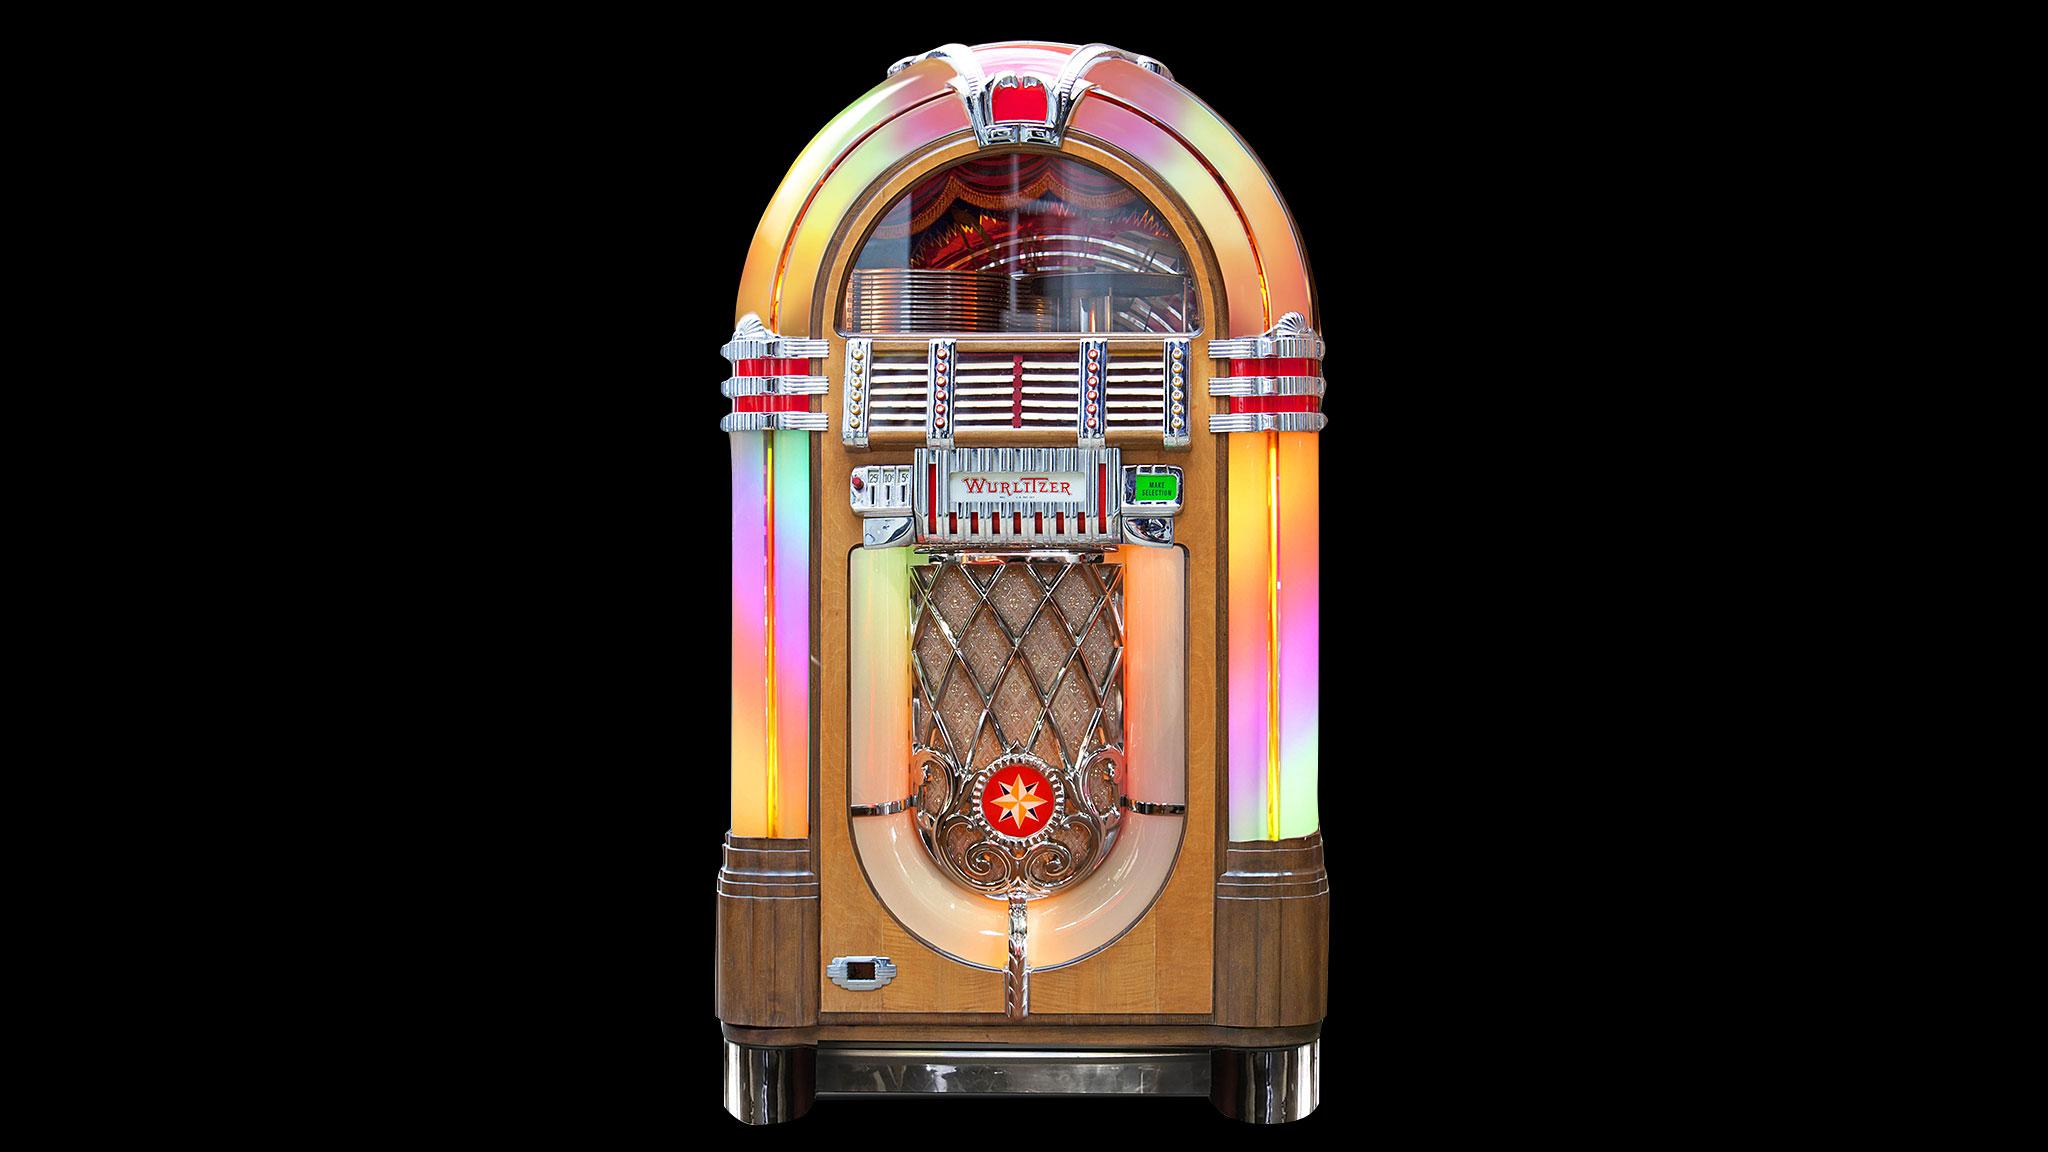 Design classic: the Wurlitzer 1015 jukebox | Financial Times